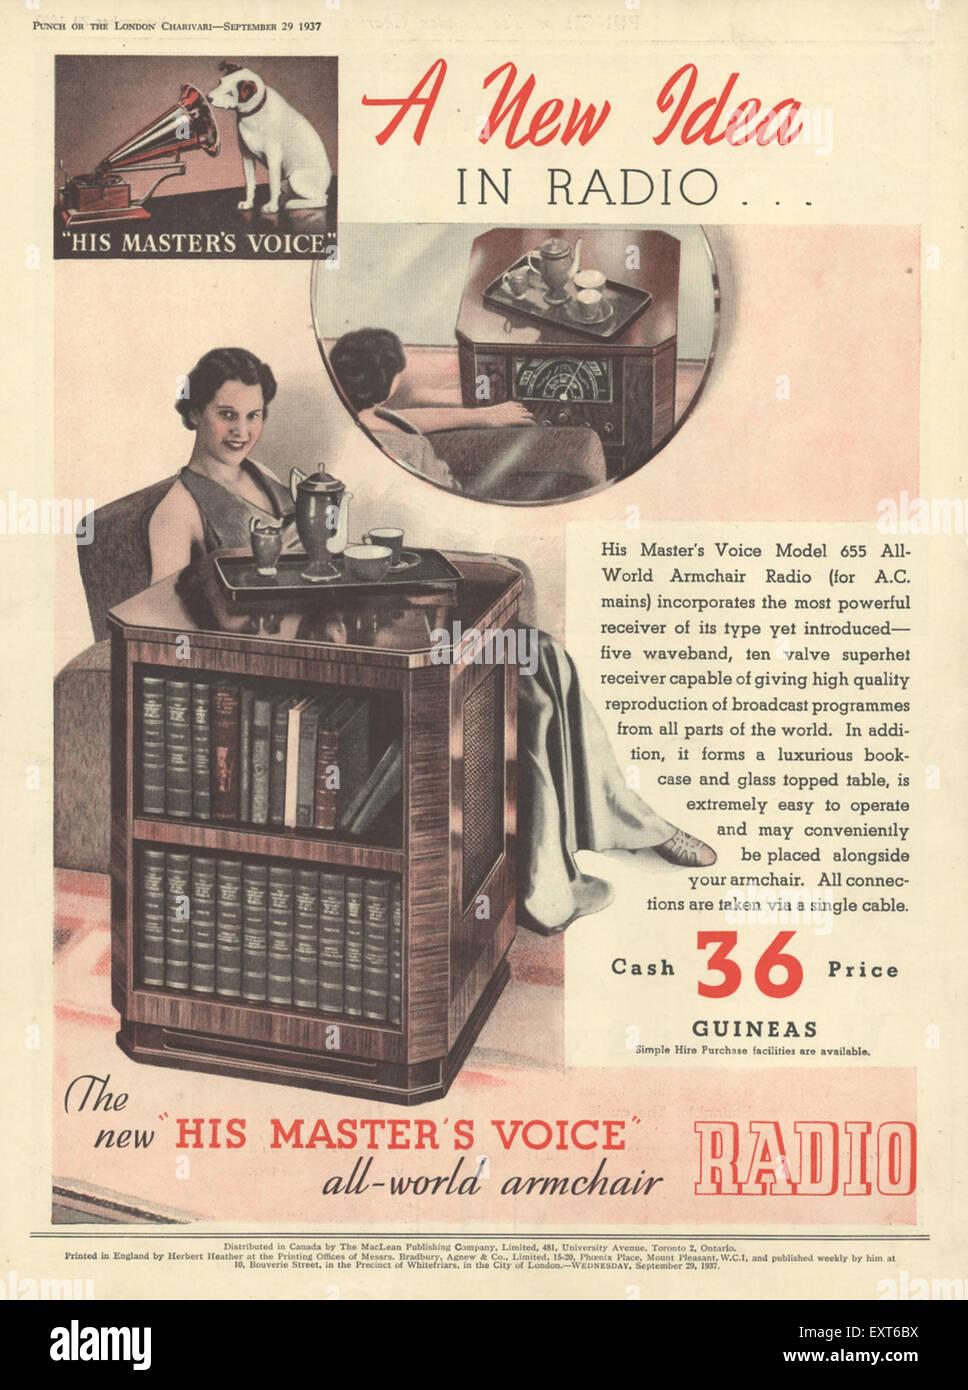 Hmv magazine advert stock photos hmv magazine advert stock images 1930s uk hmv his masters voice magazine advert stock image gumiabroncs Images